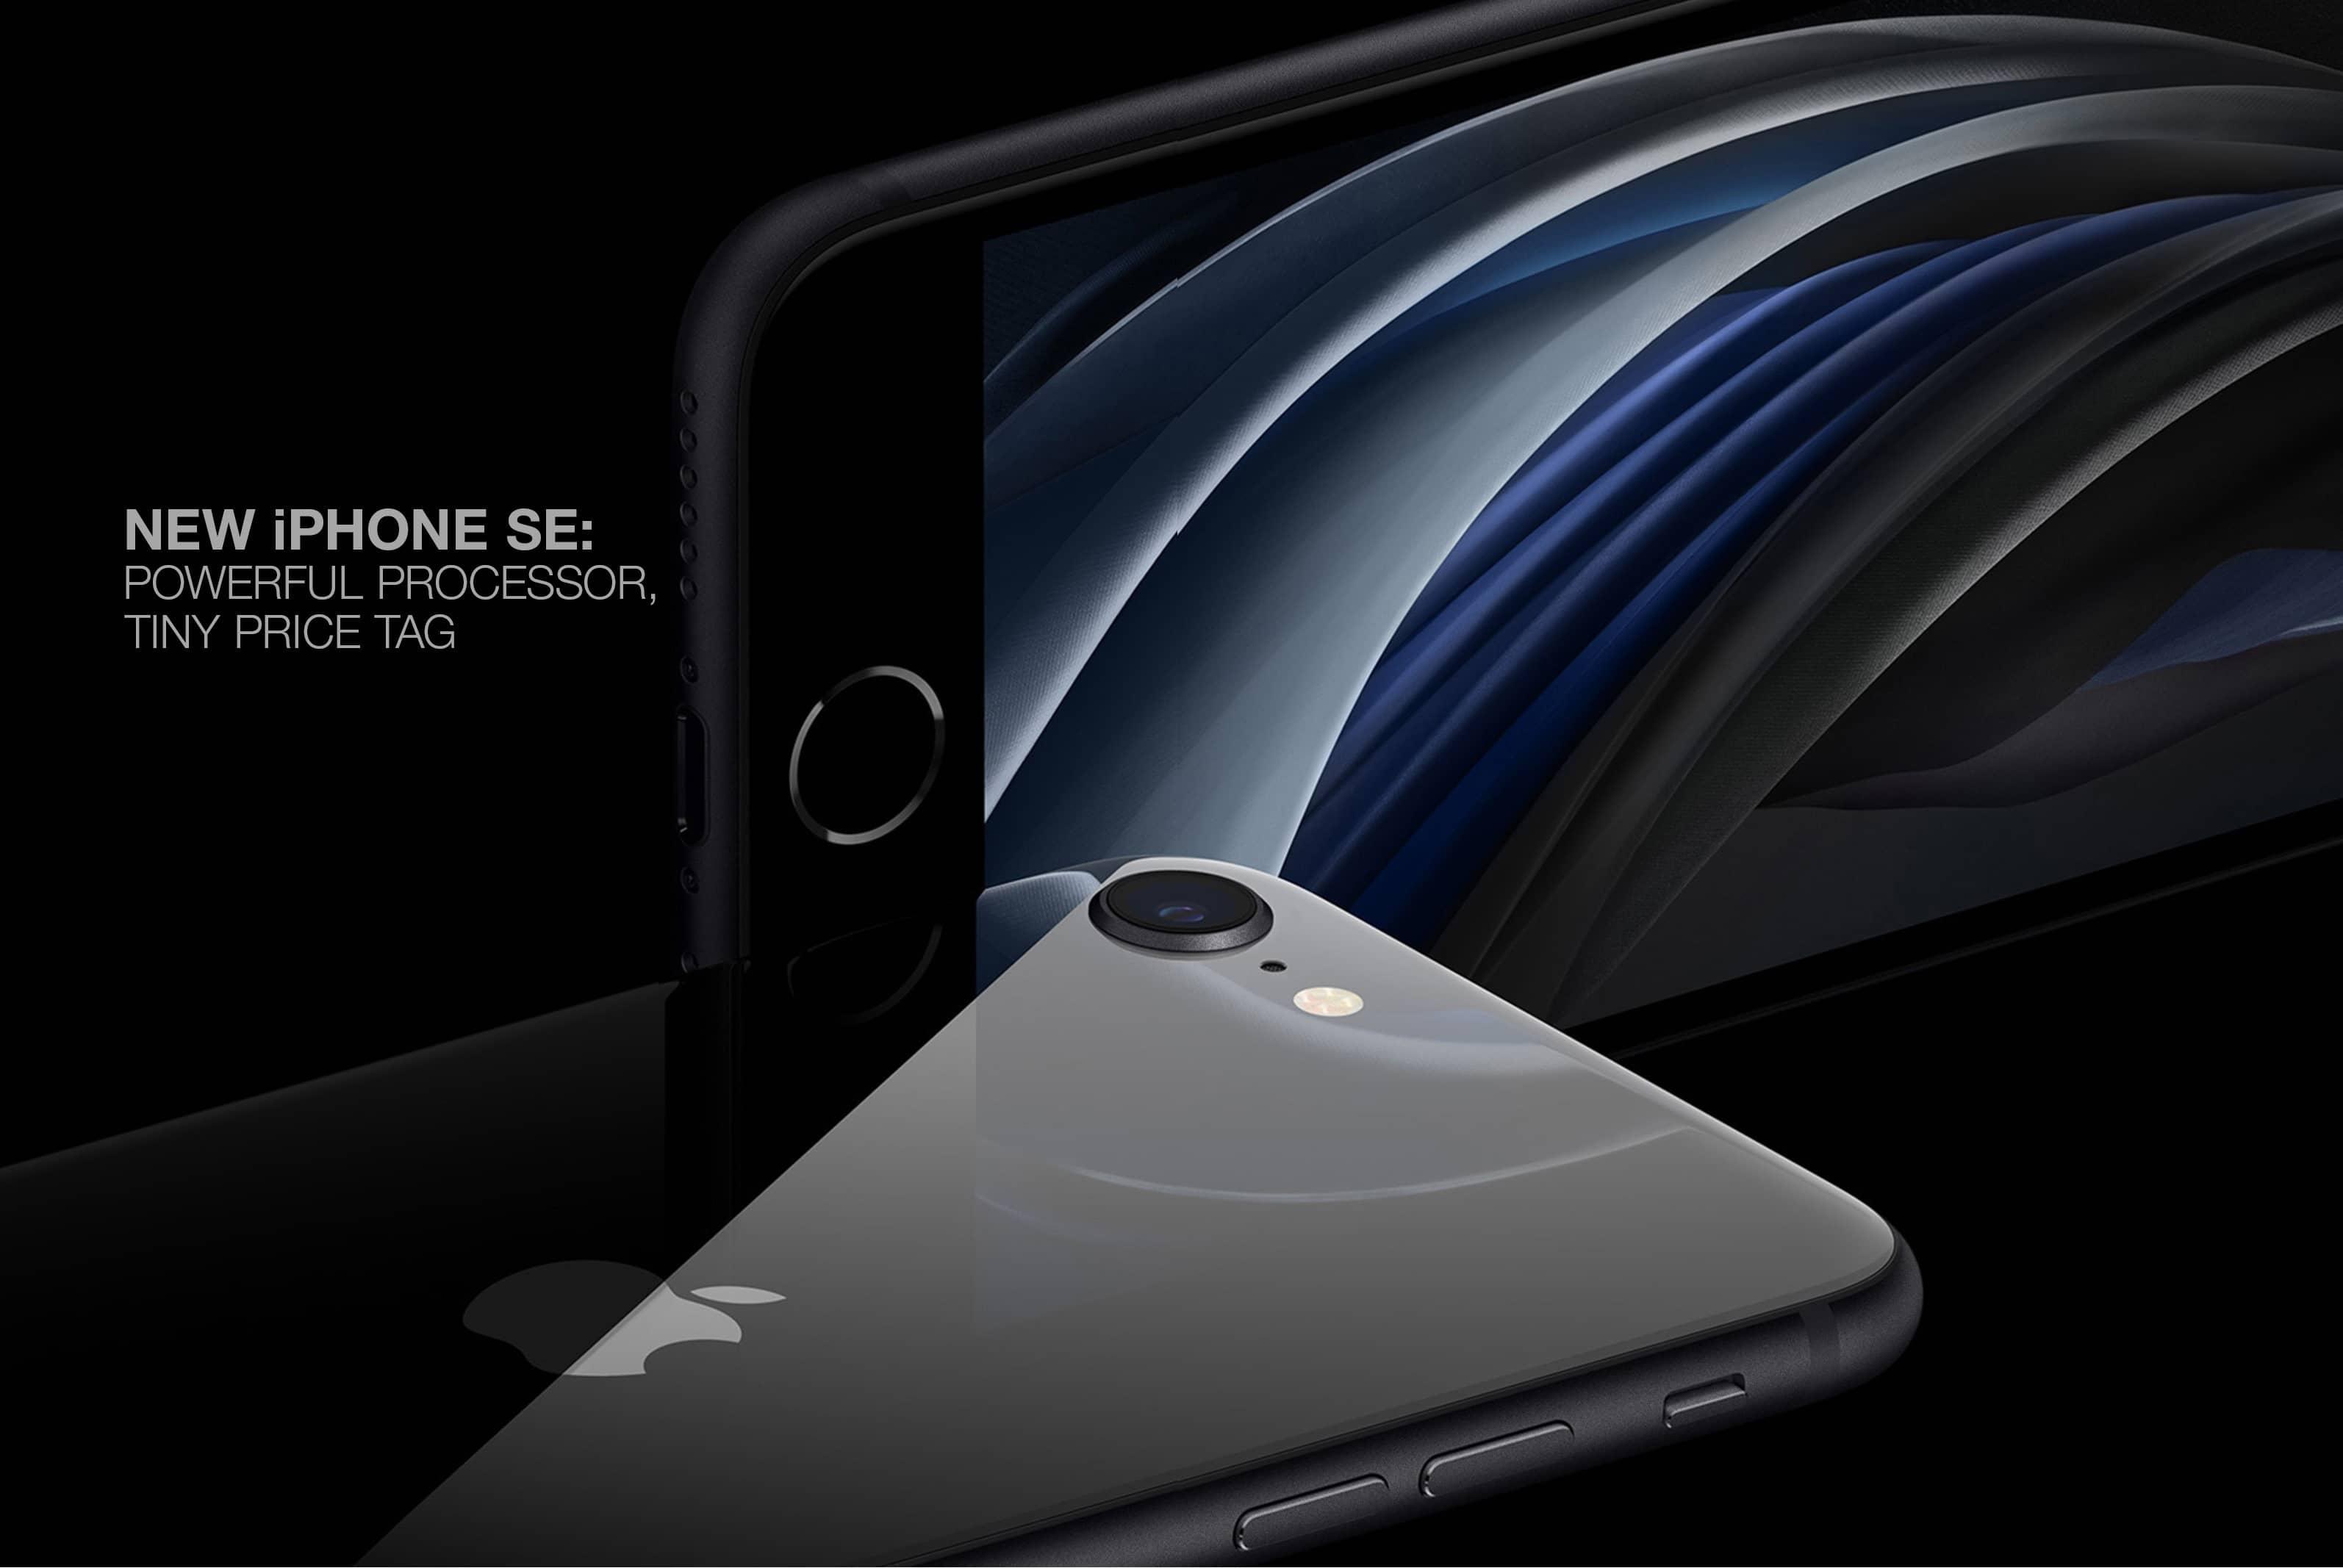 NEW iPHONE SE: POWERFUL PROCESSOR, TINY PRICE TAG